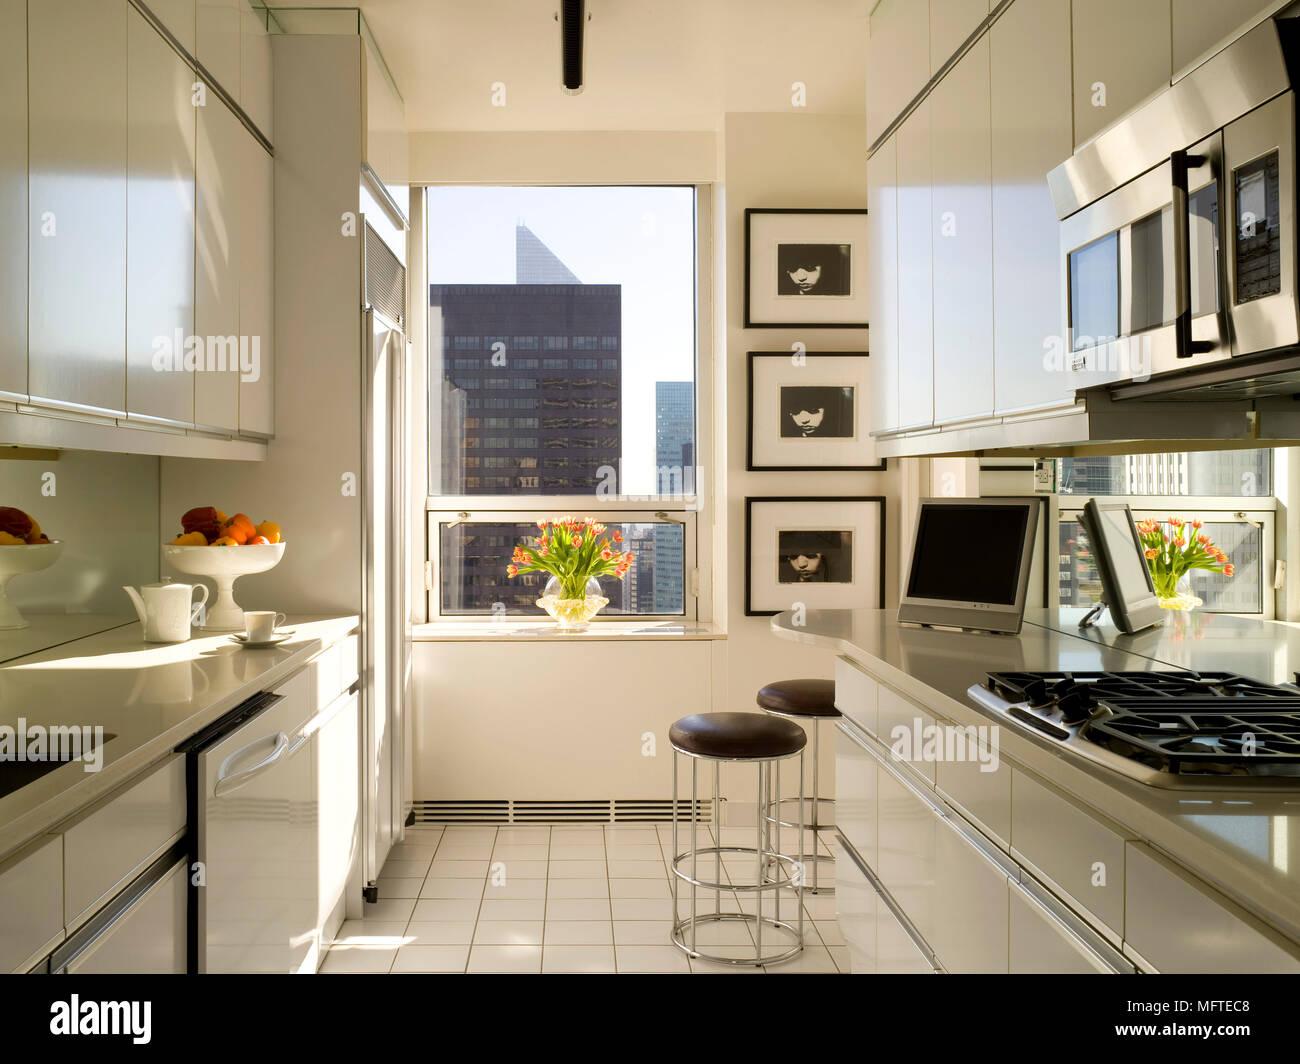 Modern galley kitchen Stock Photo: 181861688 - Alamy